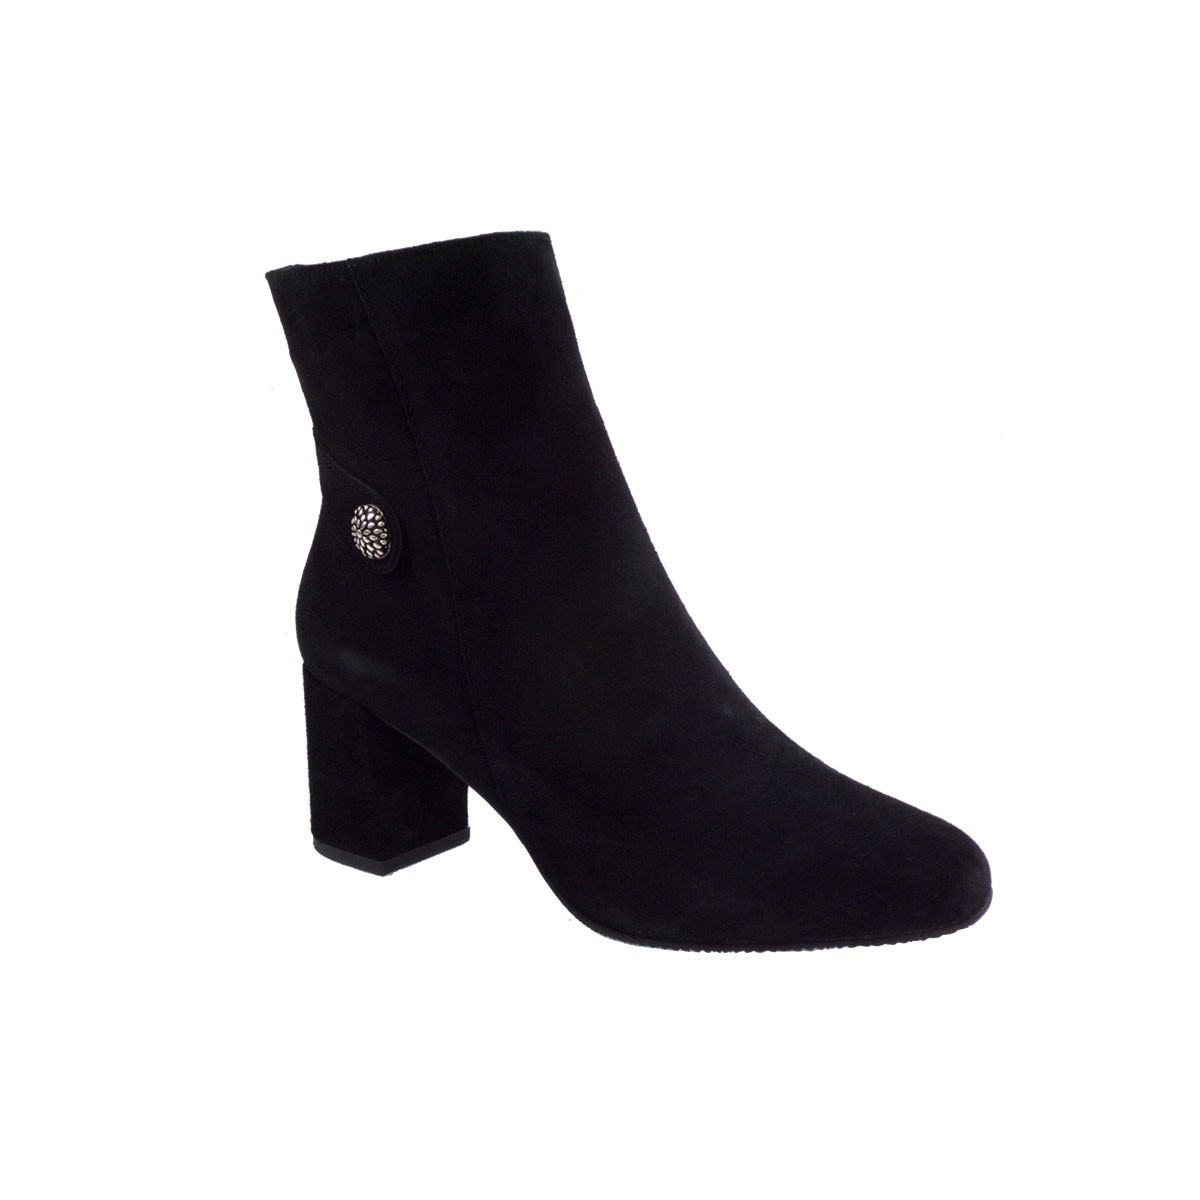 Fardoulis Shoes Γυναικεία Παπούτσια Μποτάκια 1606 Μαύρο Kαστόρι